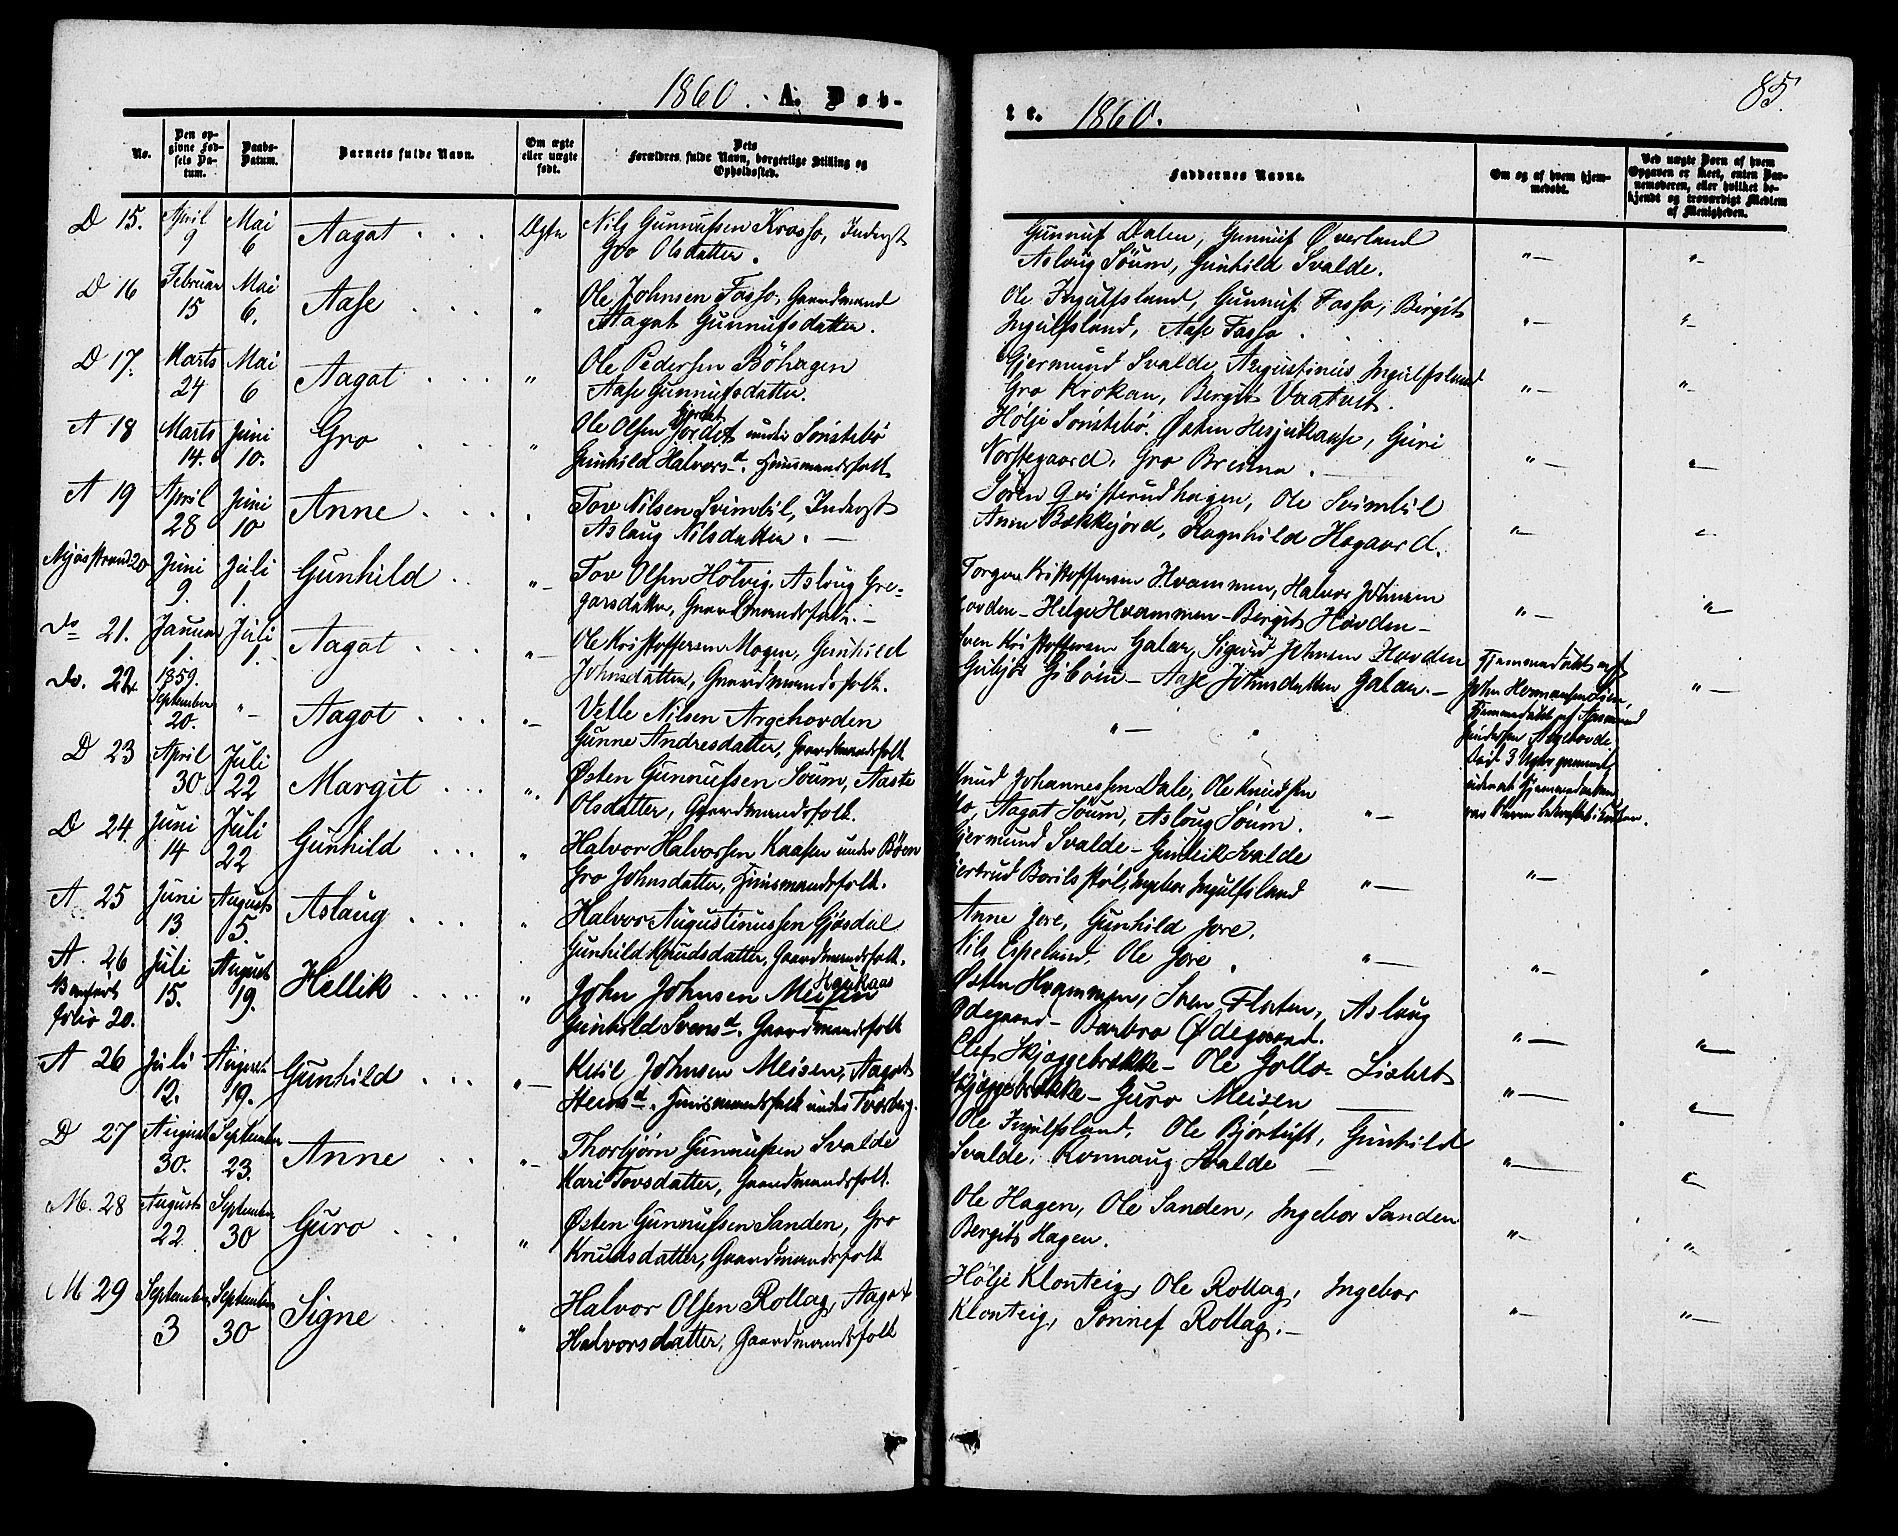 SAKO, Tinn kirkebøker, F/Fa/L0006: Ministerialbok nr. I 6, 1857-1878, s. 85